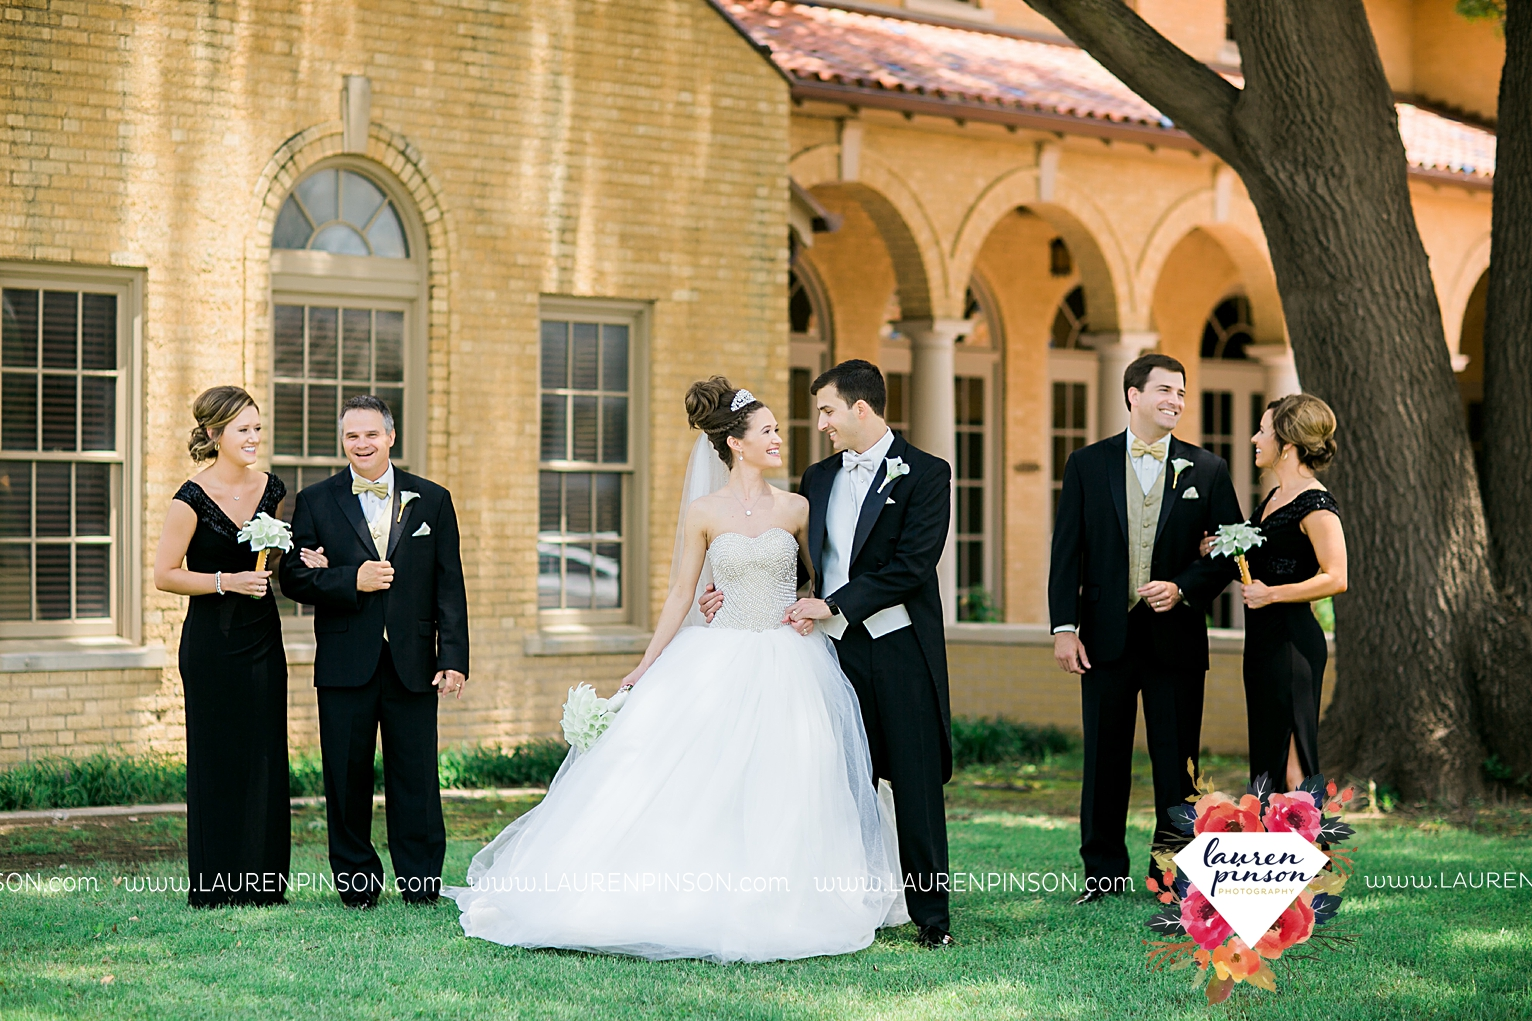 wichita-falls-texas-wedding-photographer-the-forum-by-the-kemp-mayfield-events-ulta-gold-glitter_2846.jpg